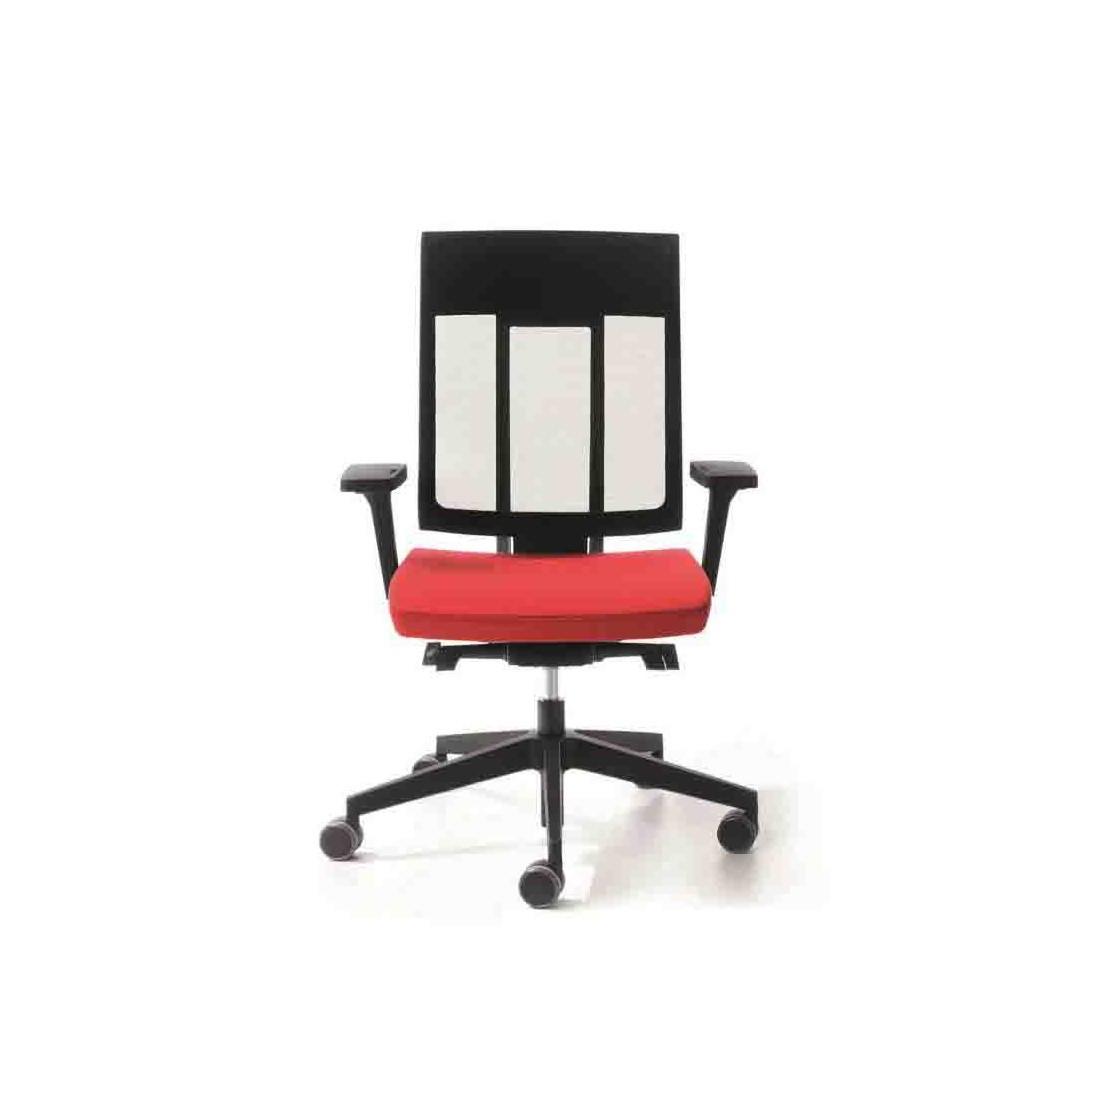 Эргономичное кресло Xenon net